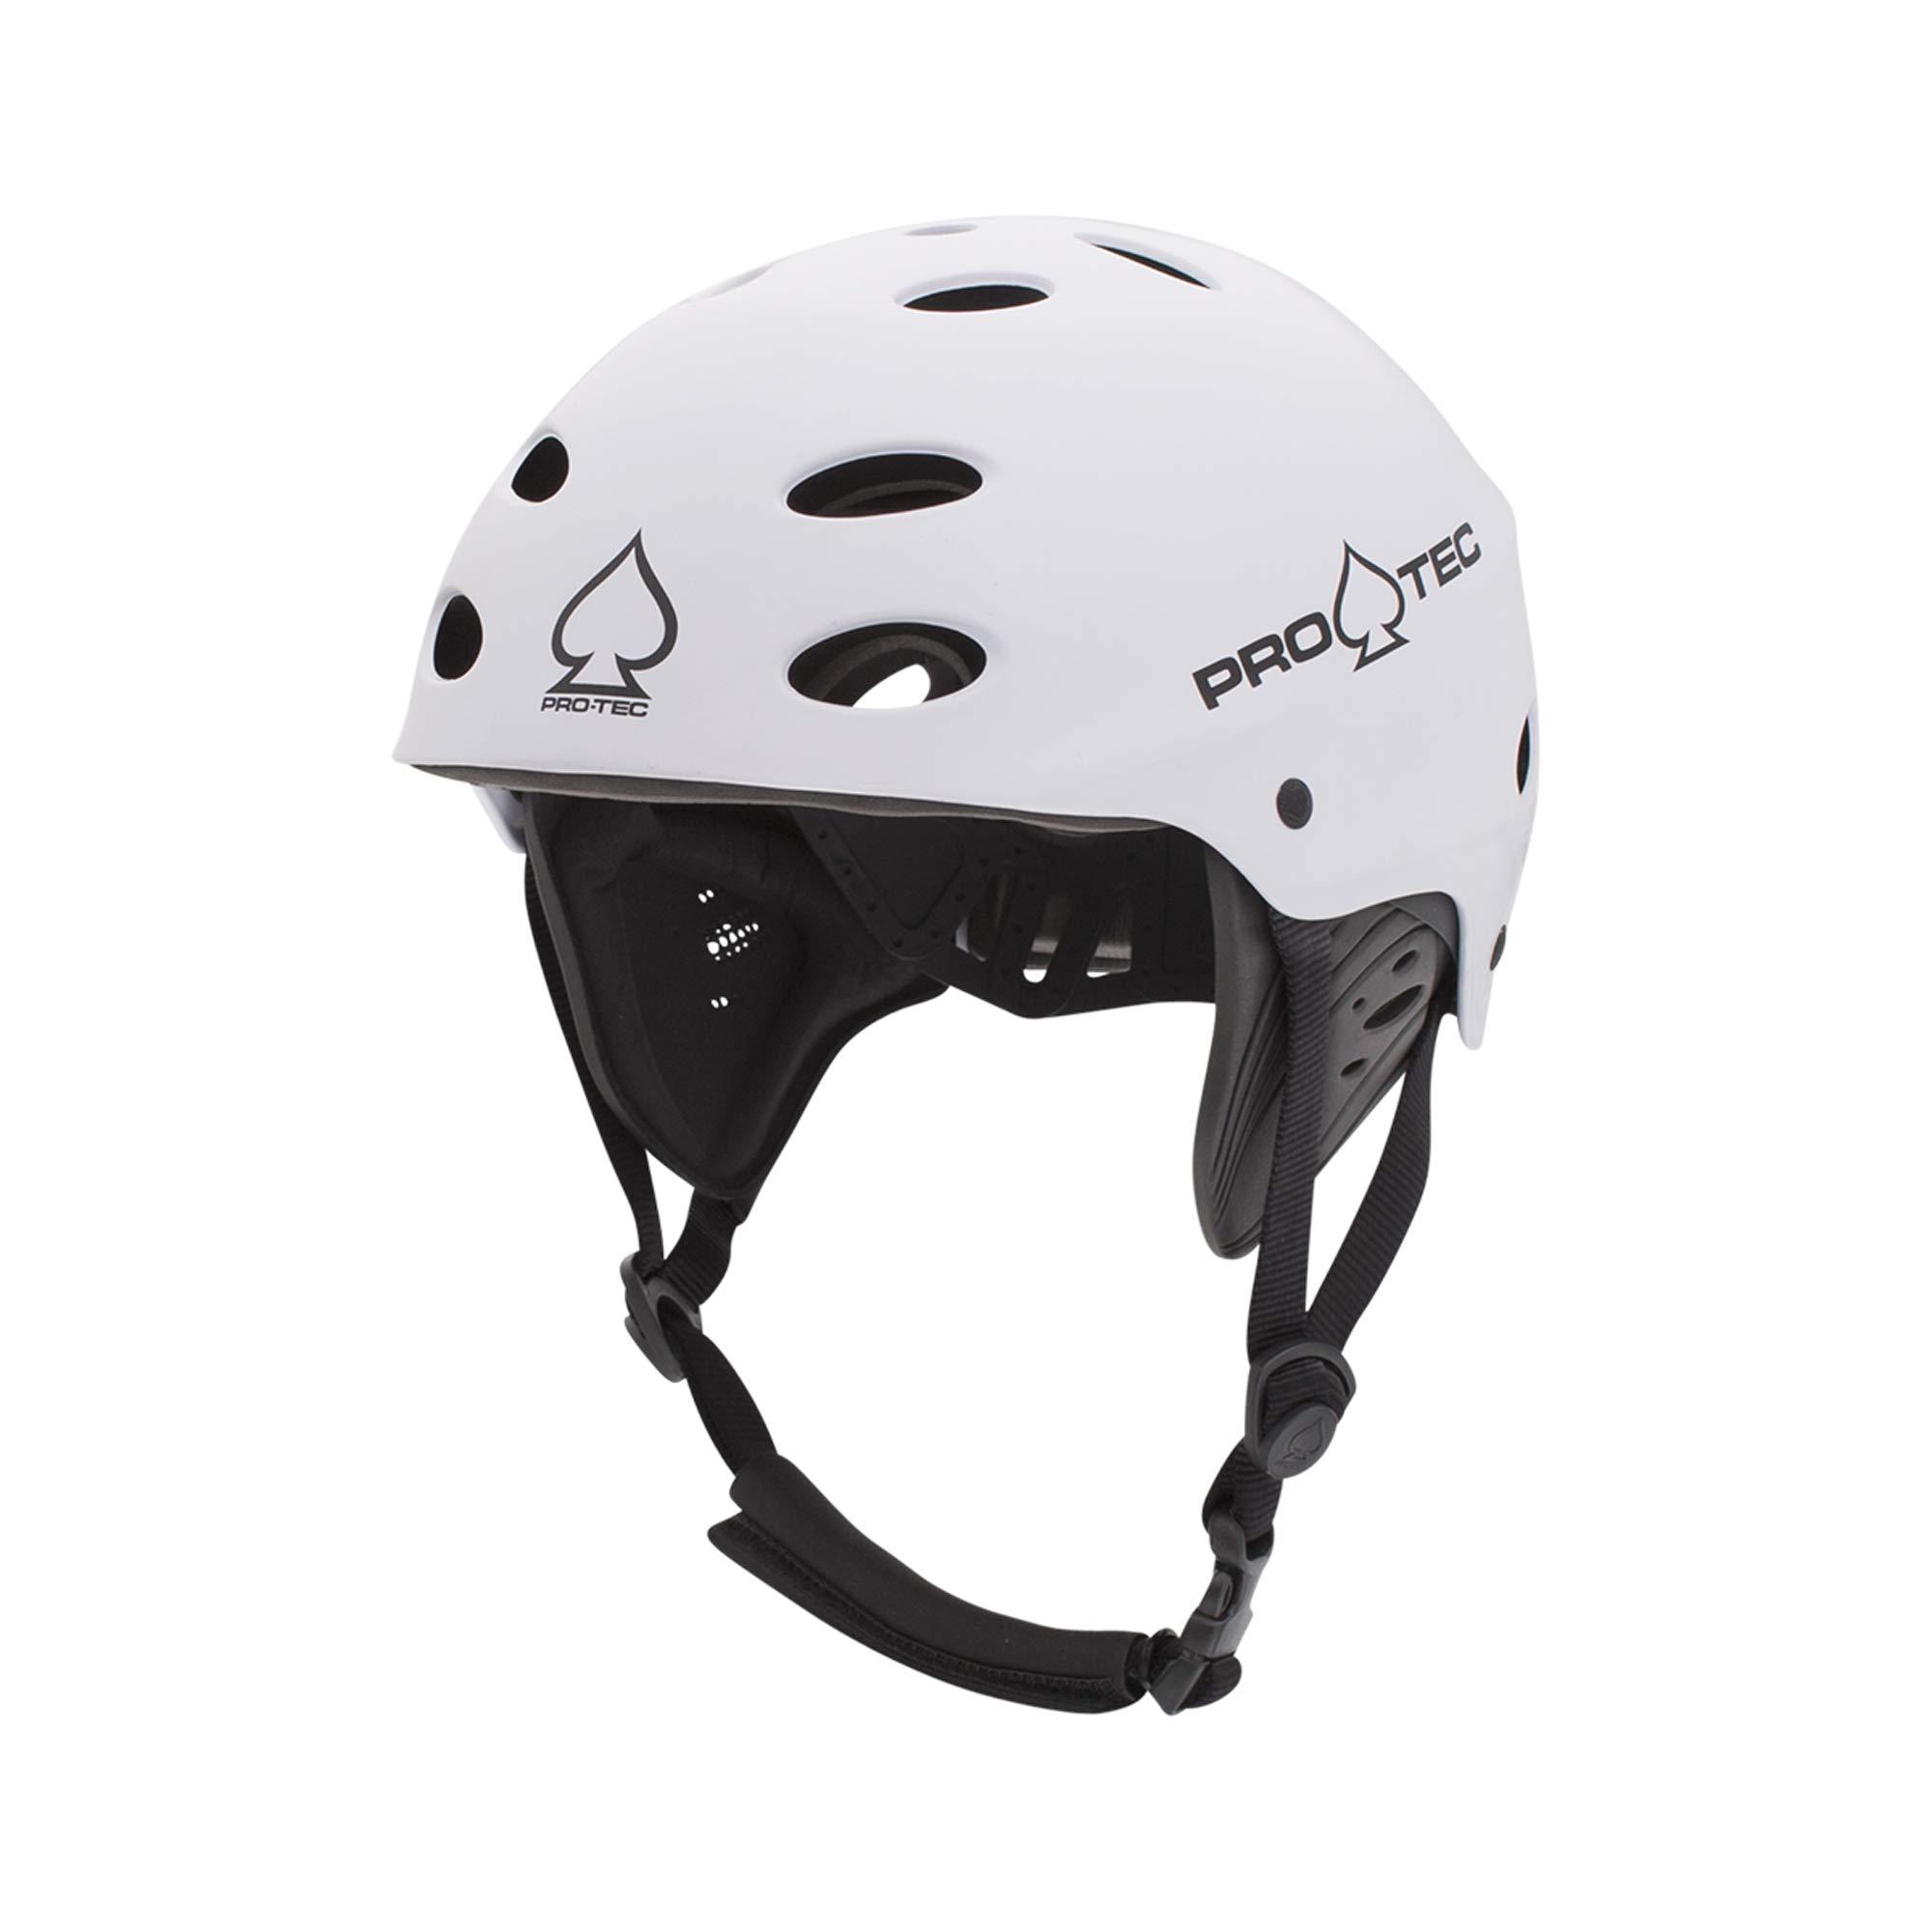 Pro-Tec Ace Wake Helmet, Satin White, S by Pro-Tec